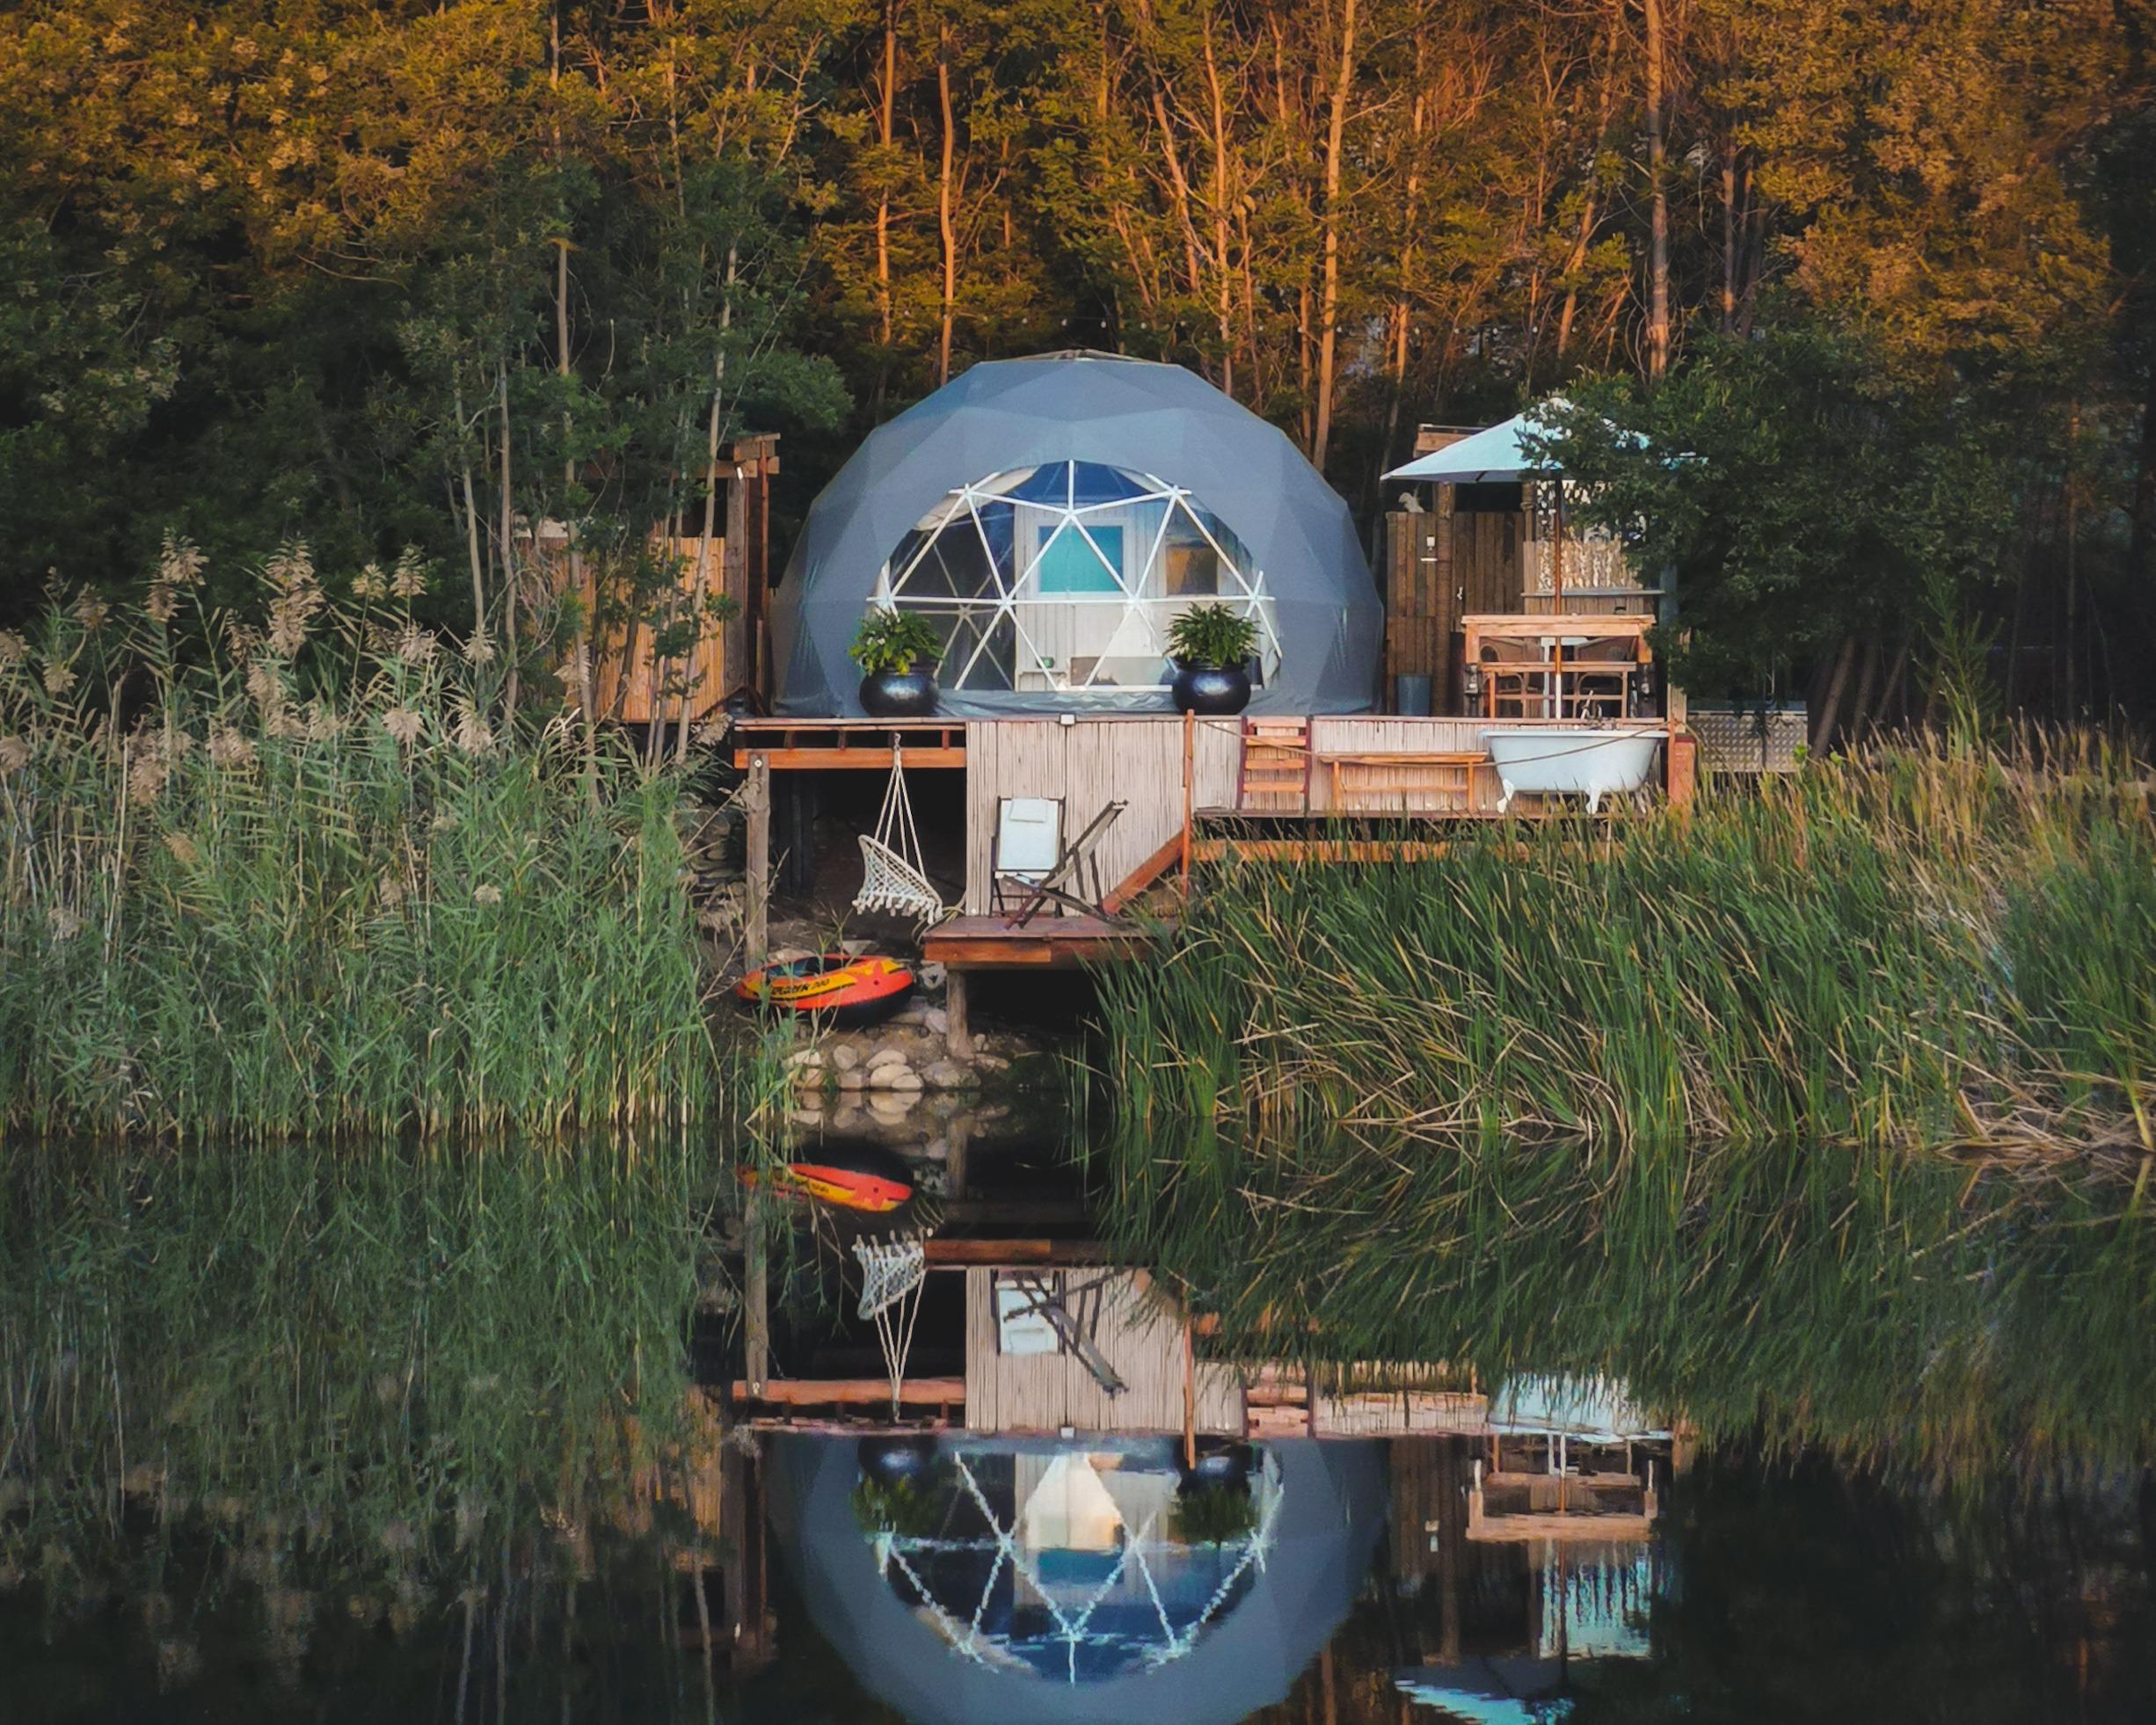 Sunset Dome - 01